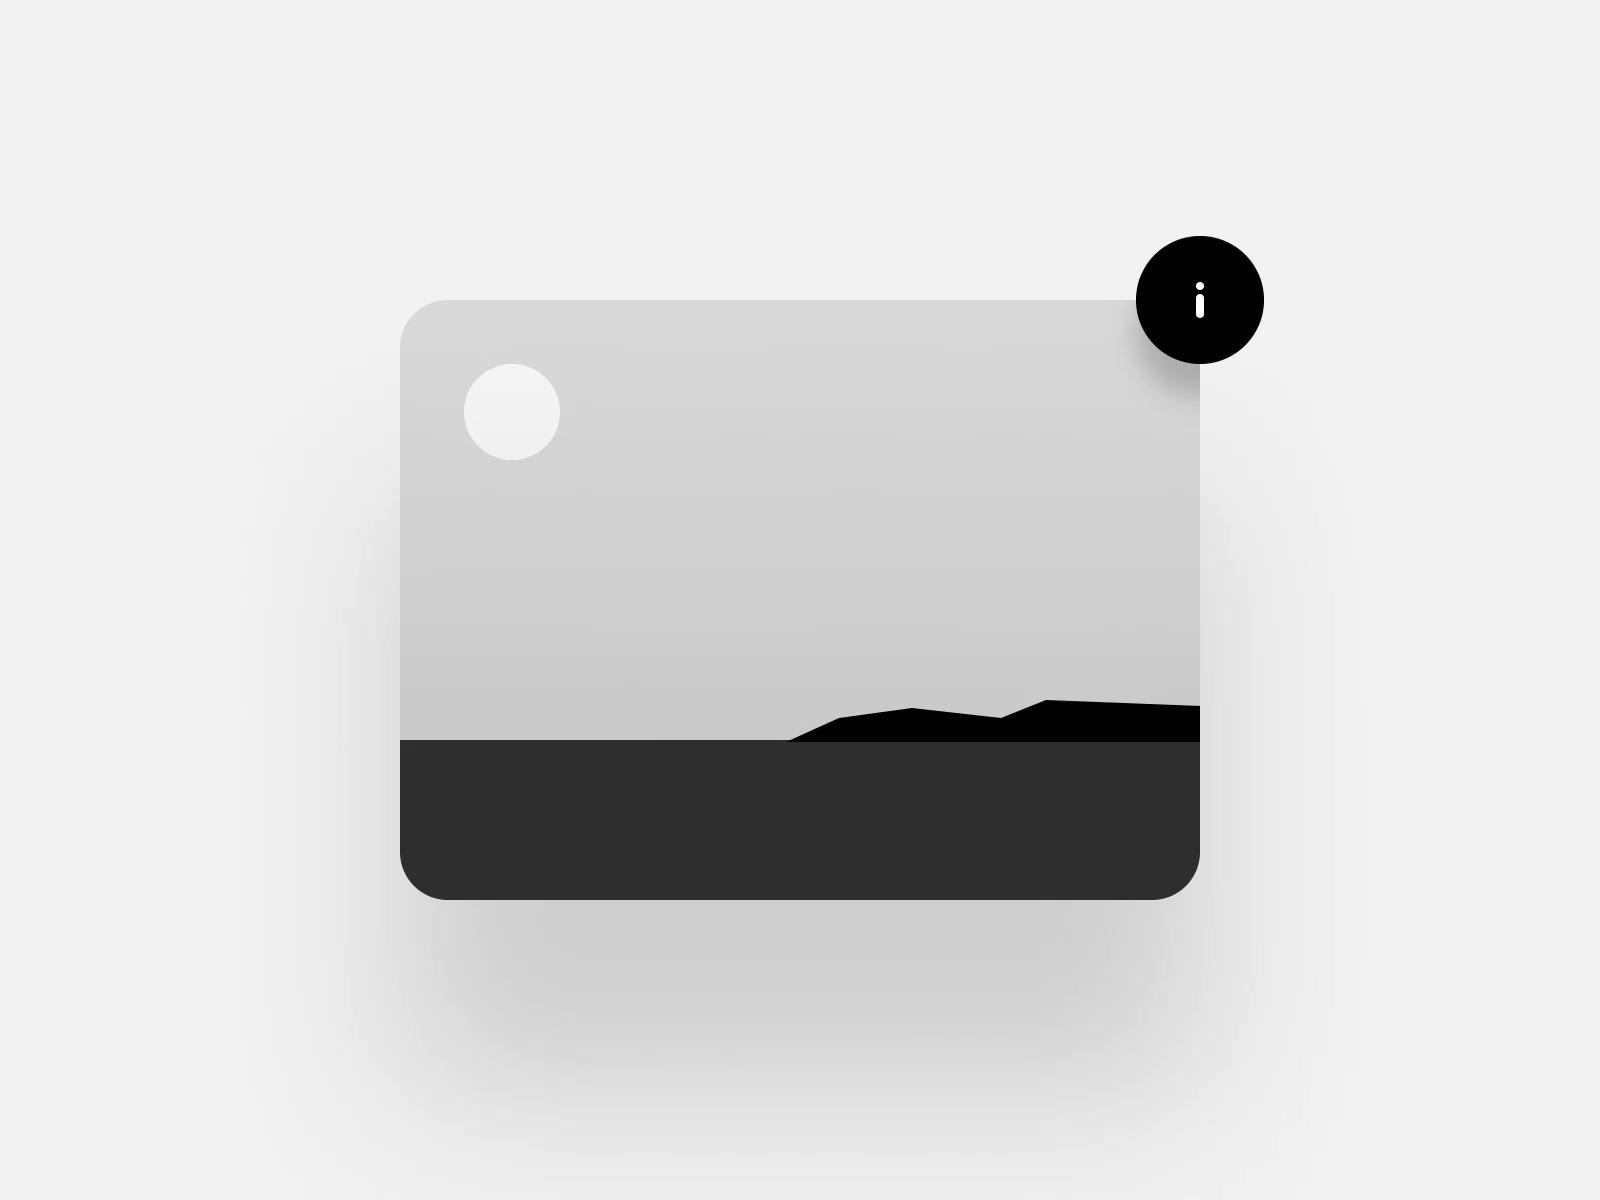 Info button interaction